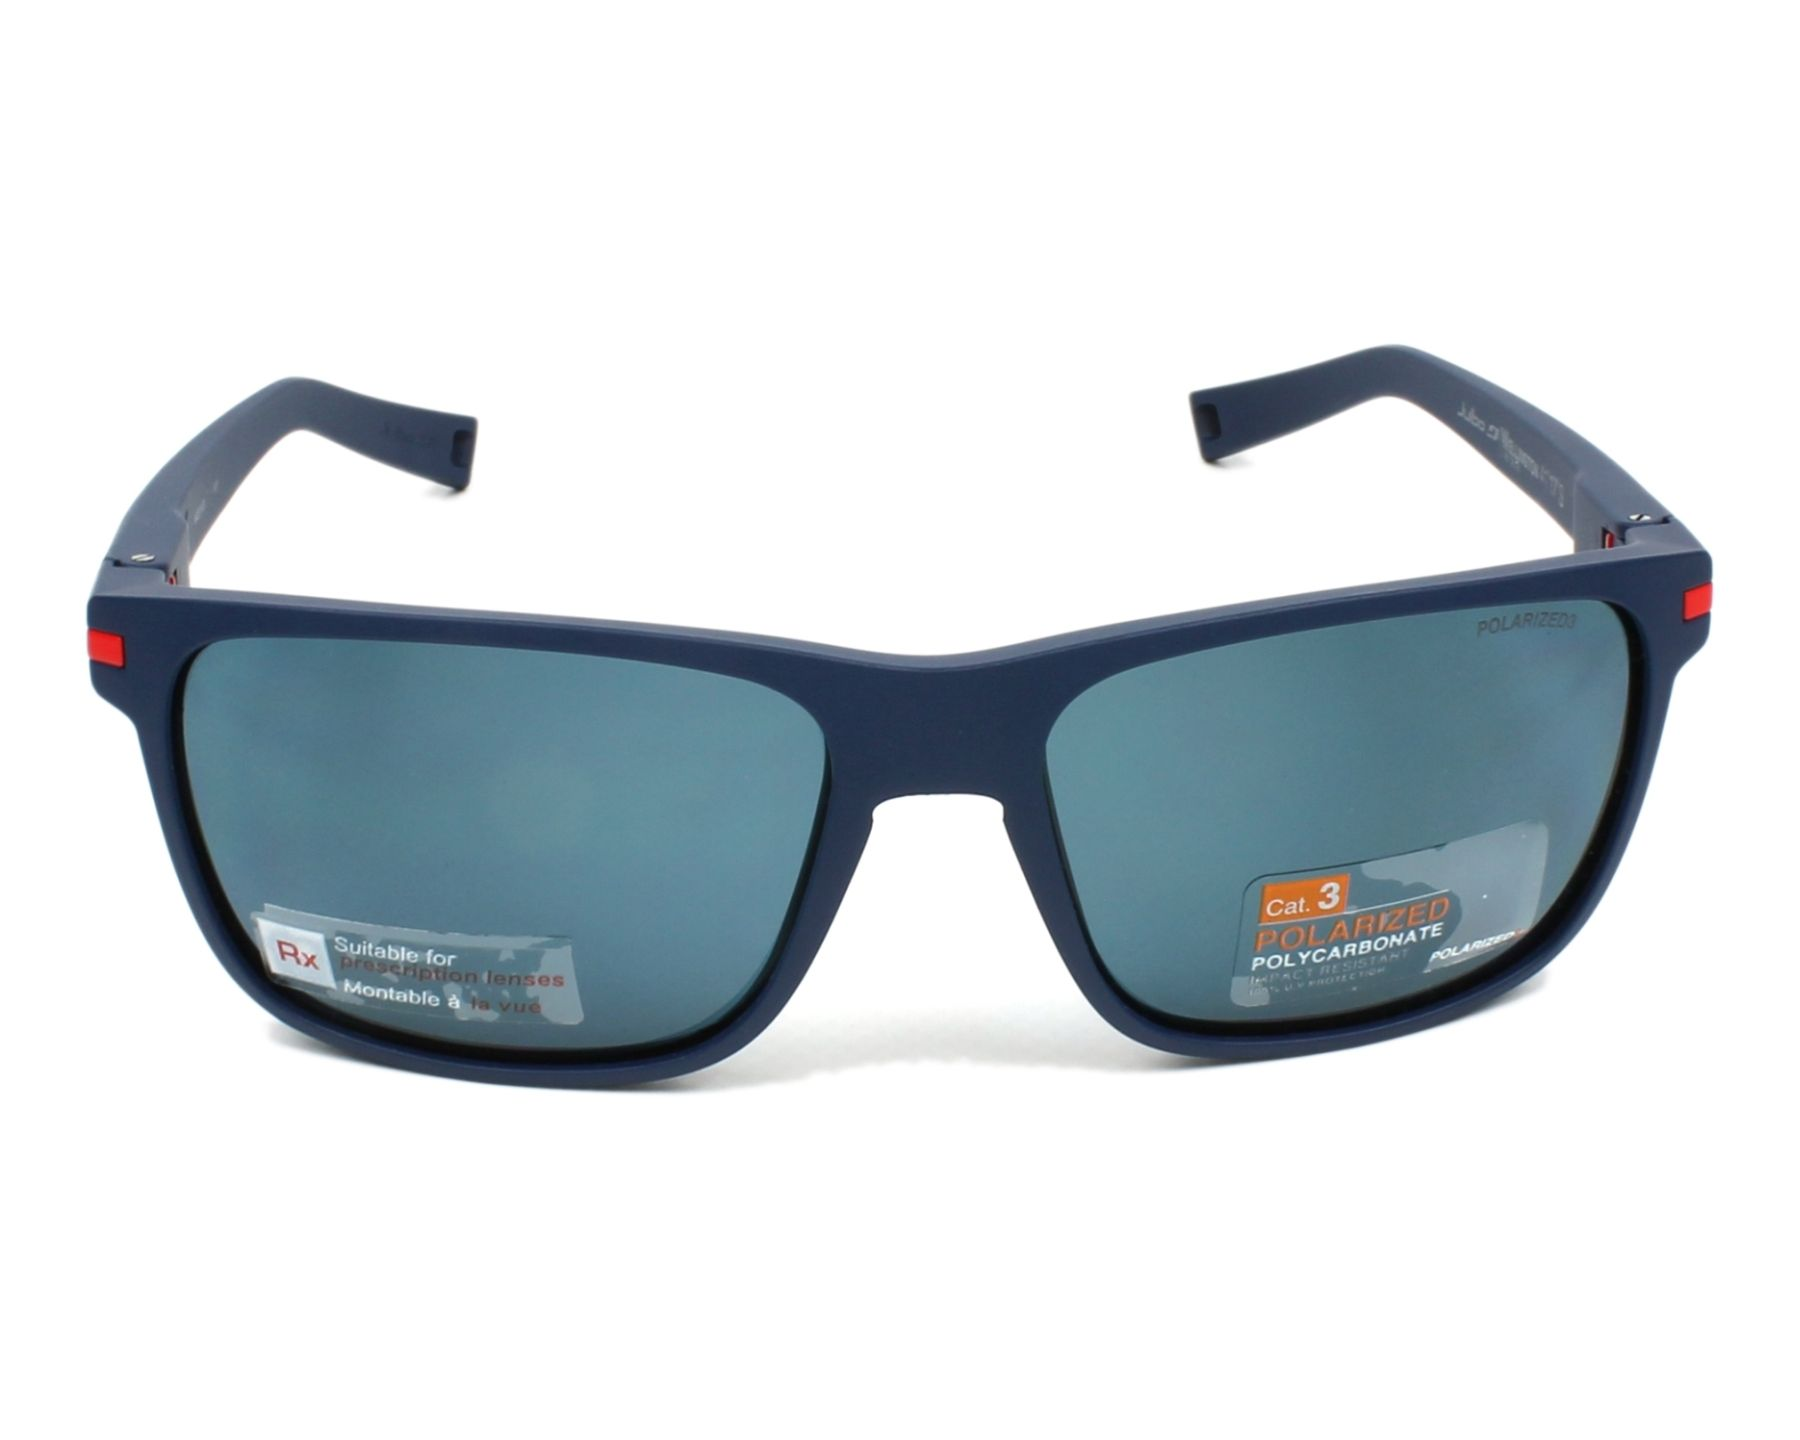 b4e89bc118b Sunglasses Julbo J481 9036 - Blue front view